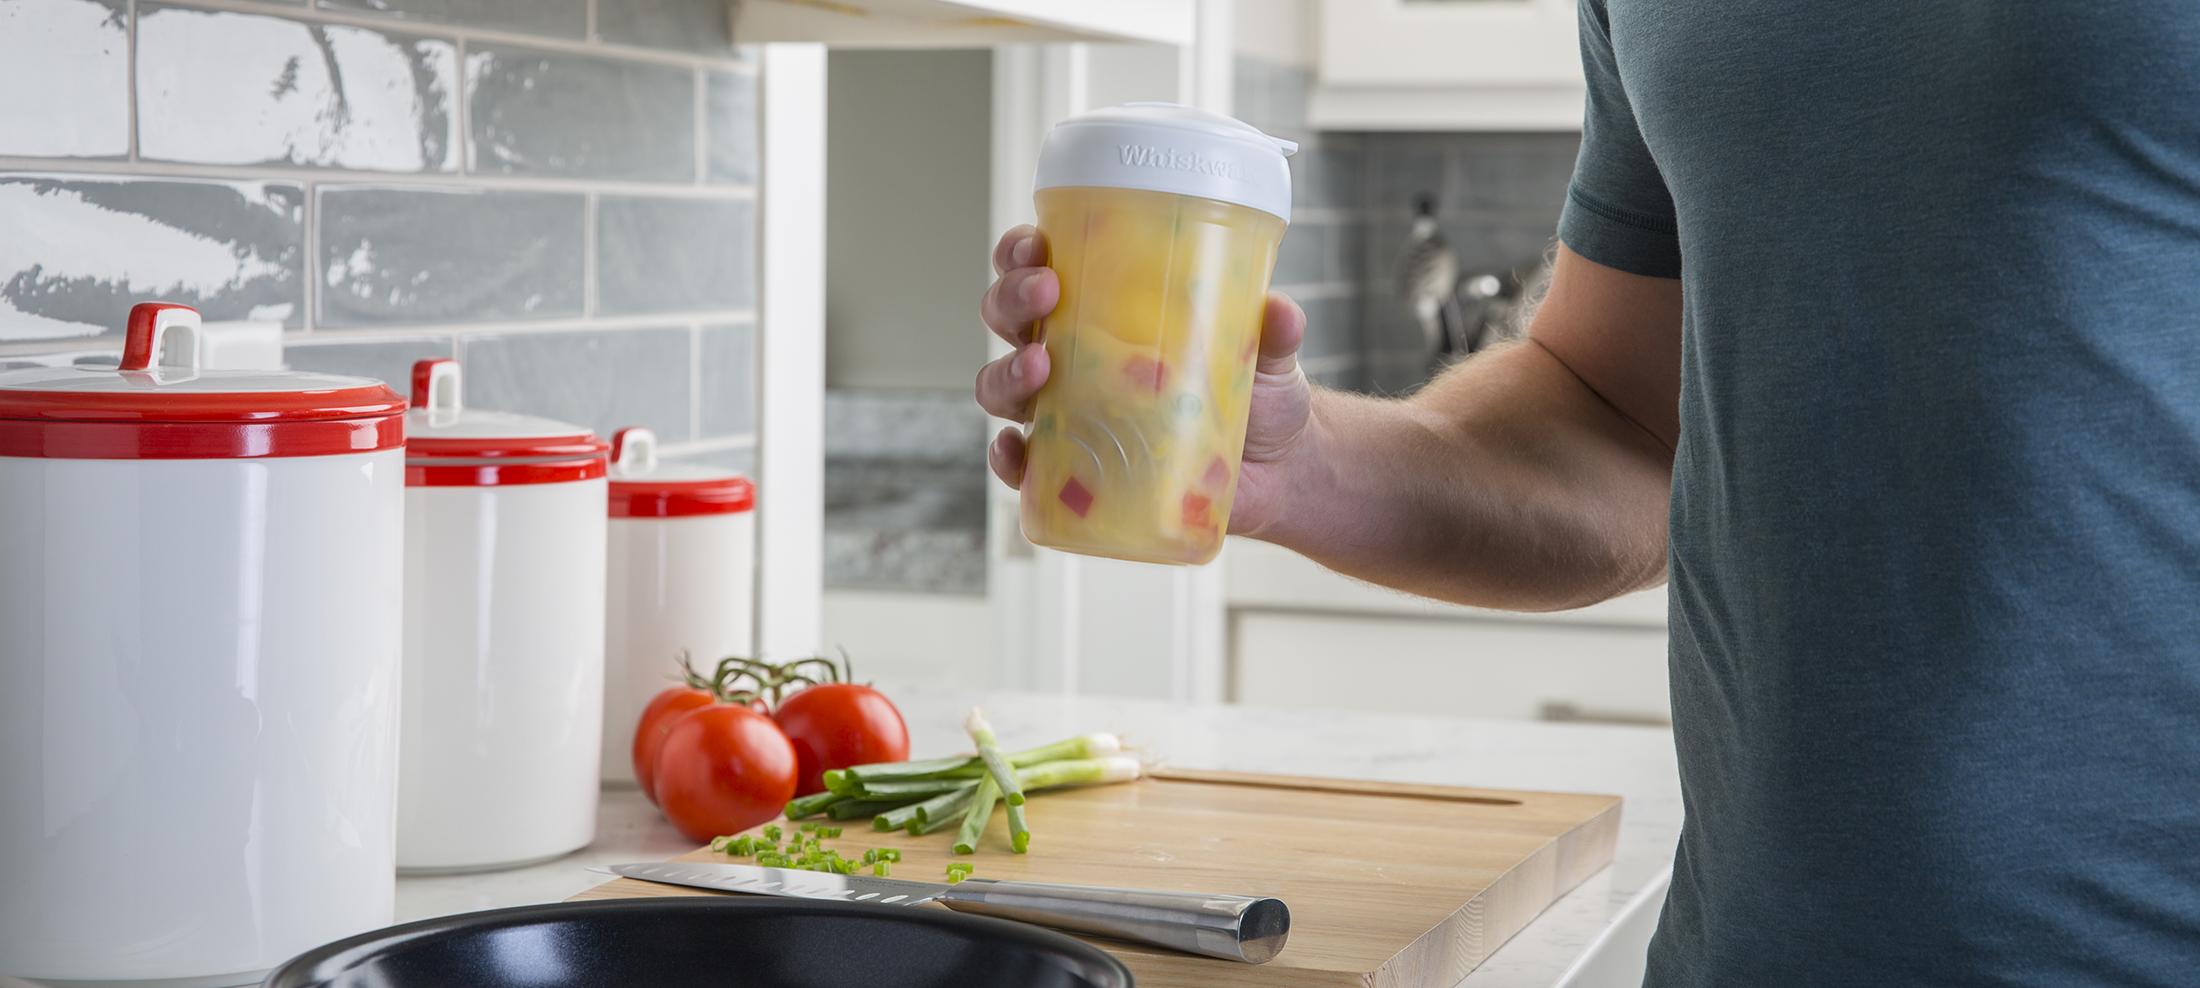 egg-mixer-up-to-8-eggs5kYdSgomXKJYh